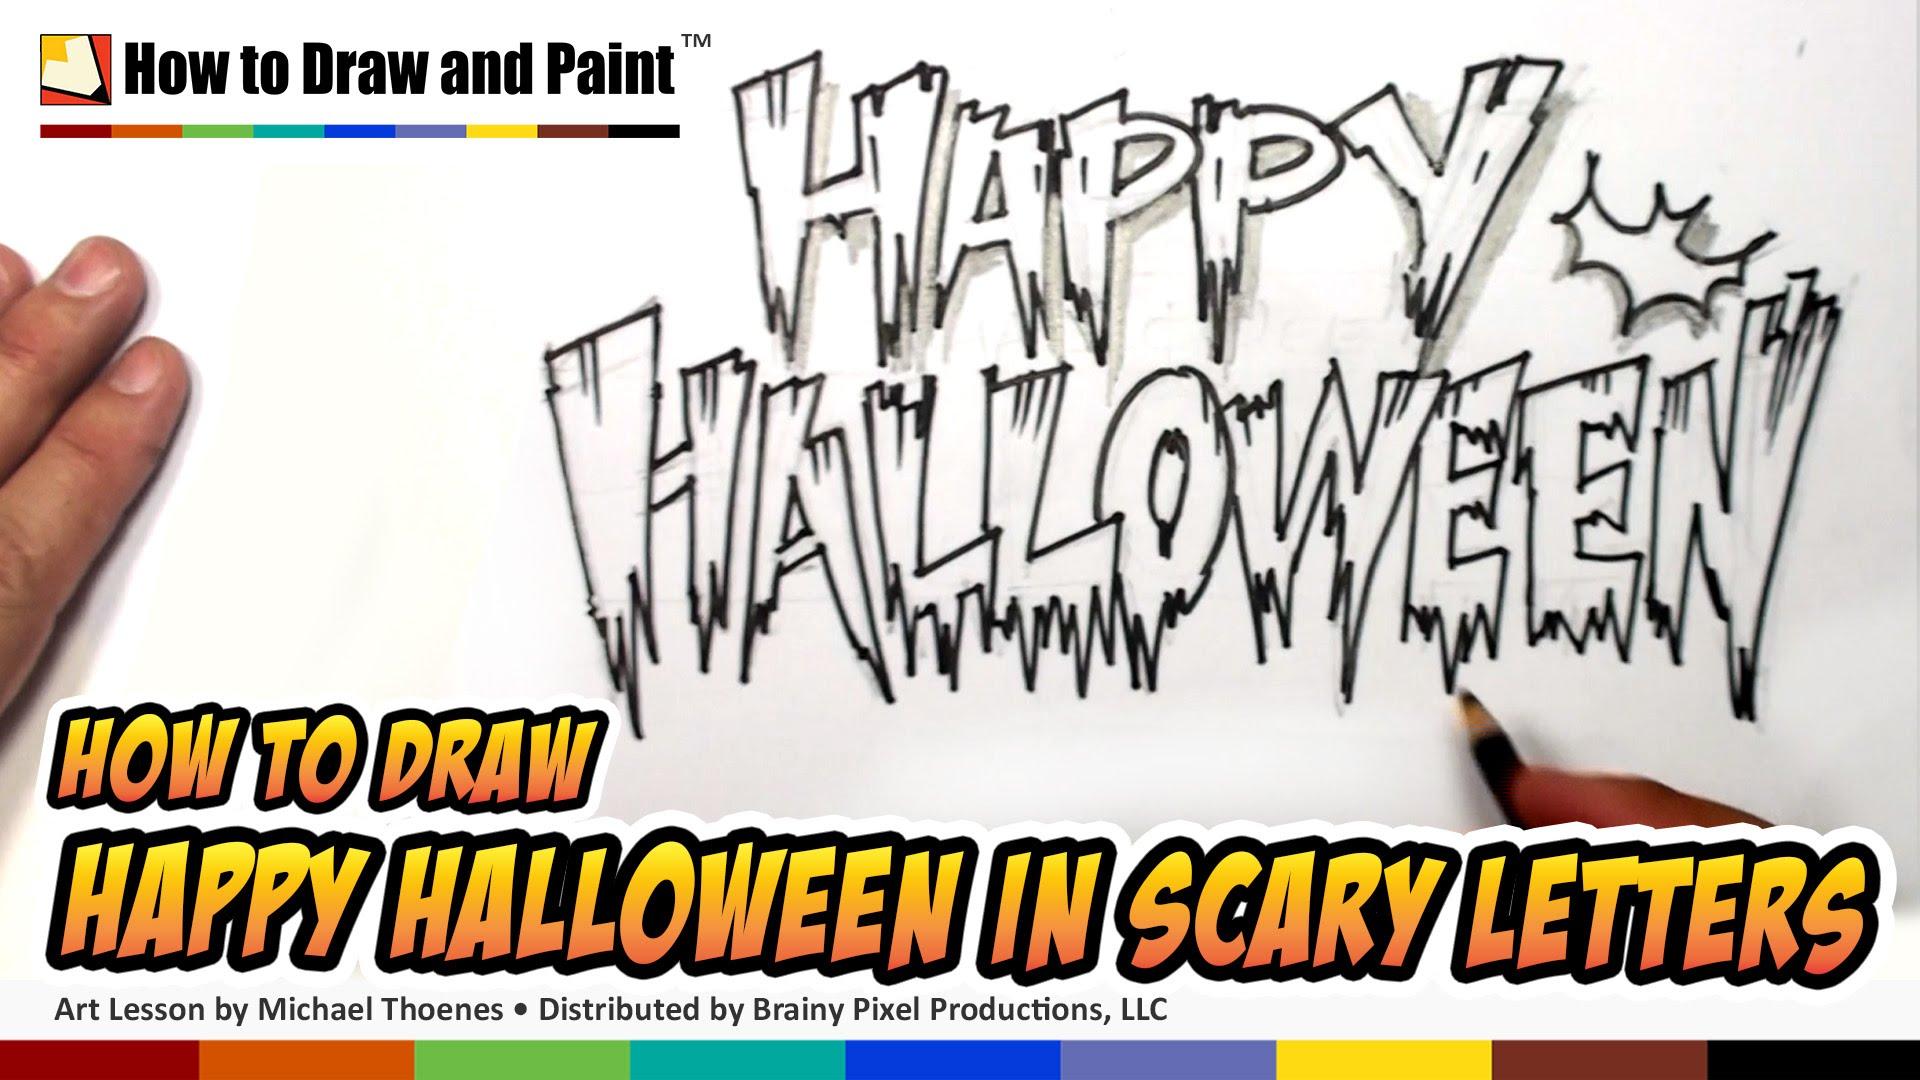 Drawn pixel art halloween How Happy Halloween to Letters